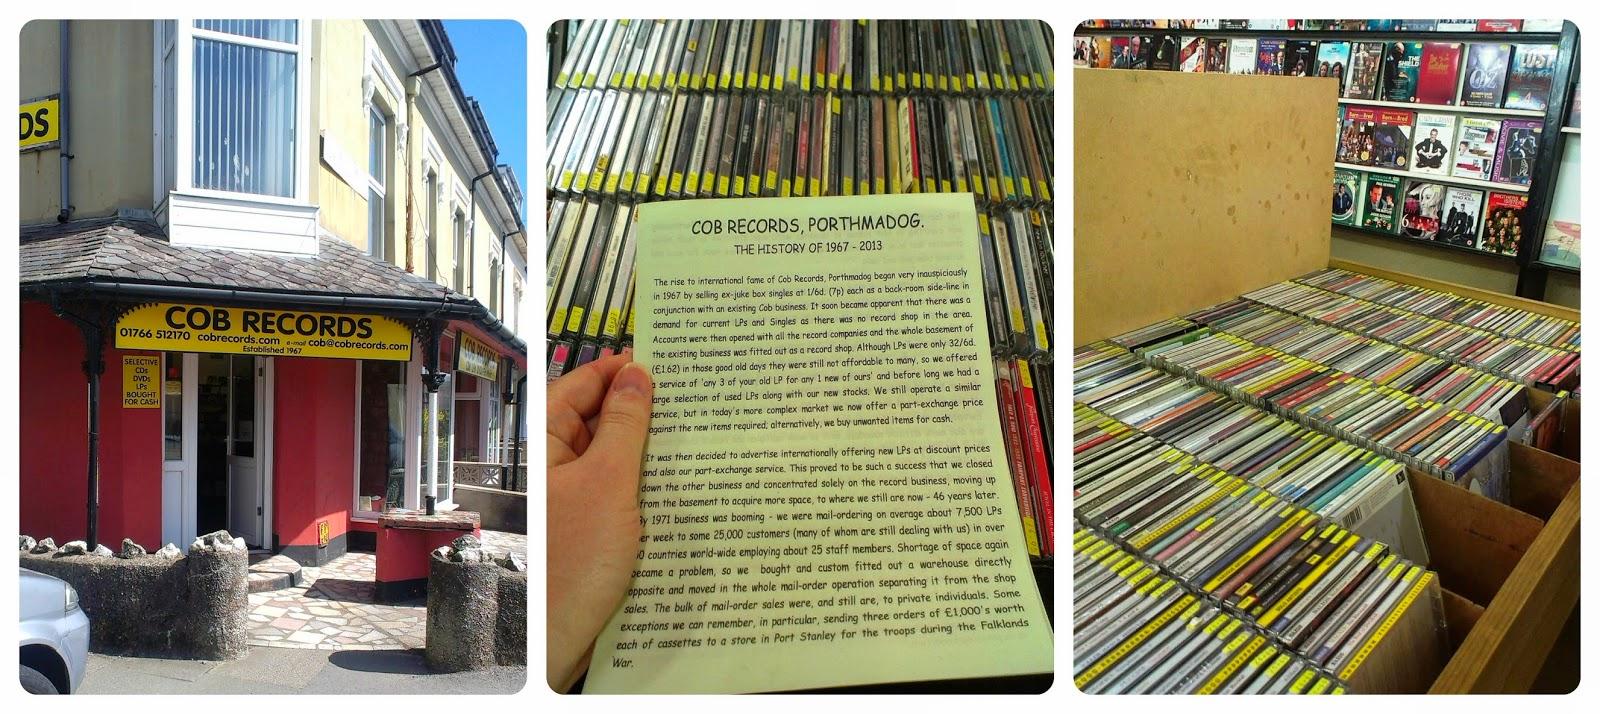 Cob Records, Porthmadog